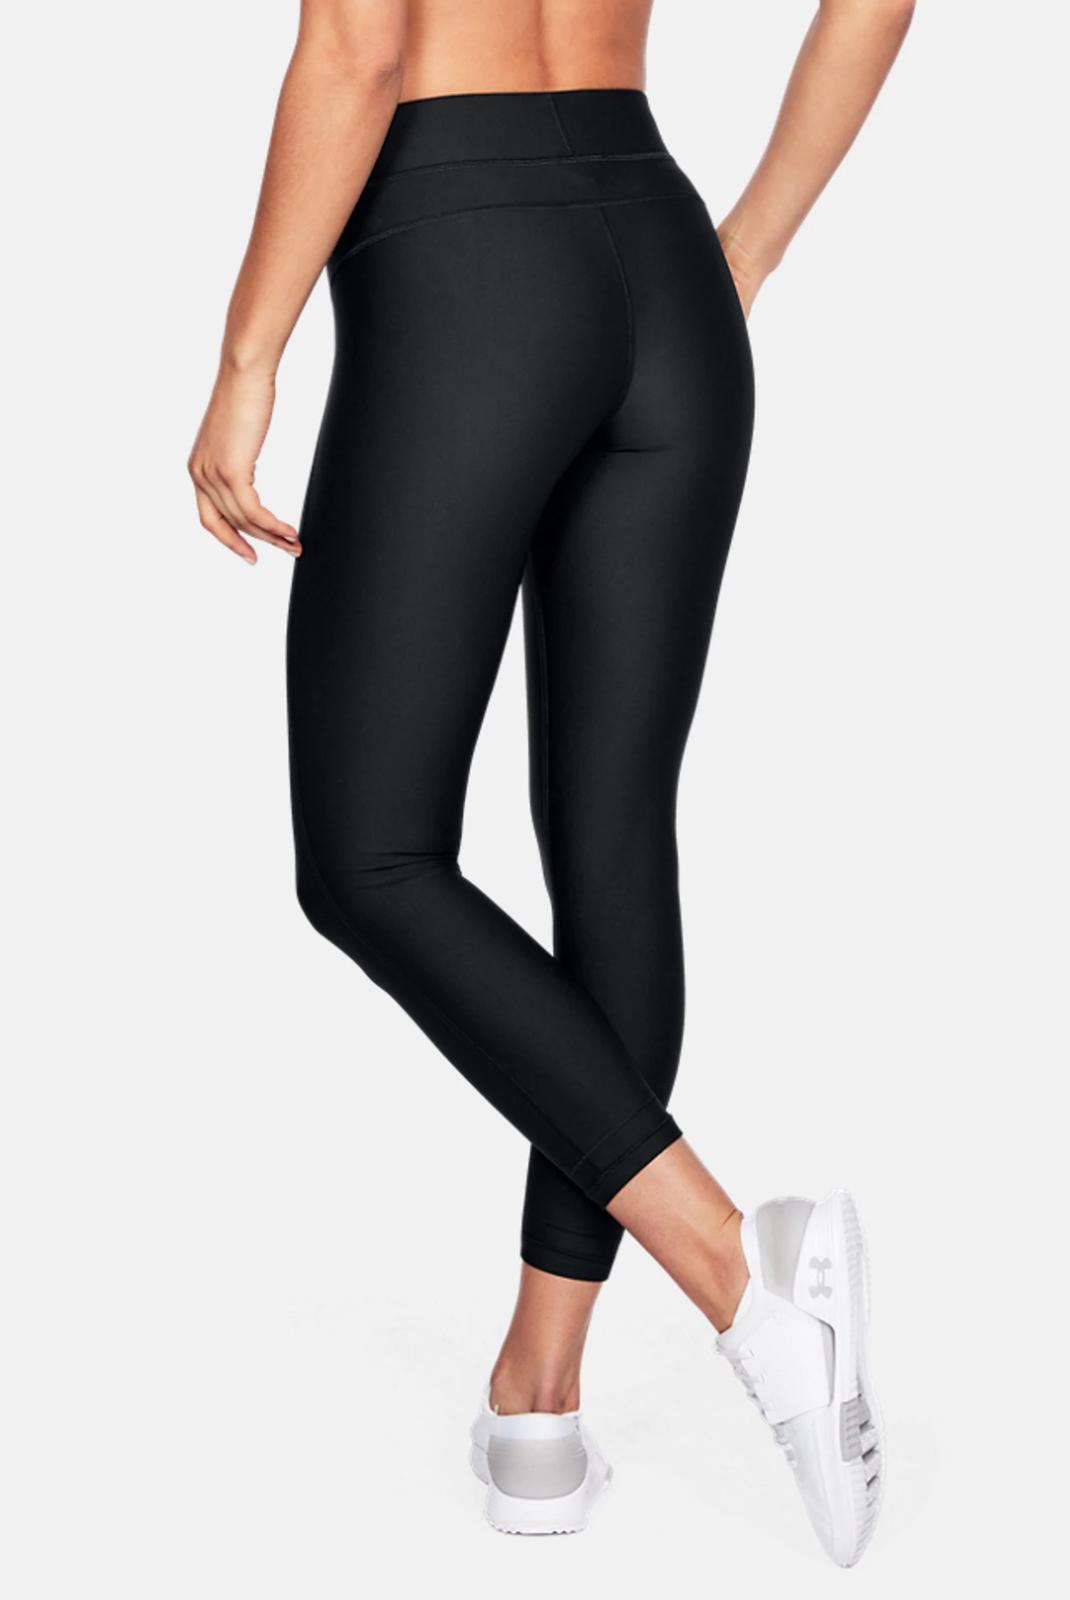 Pantalons  Under armour 1309628-001 001 BLACK